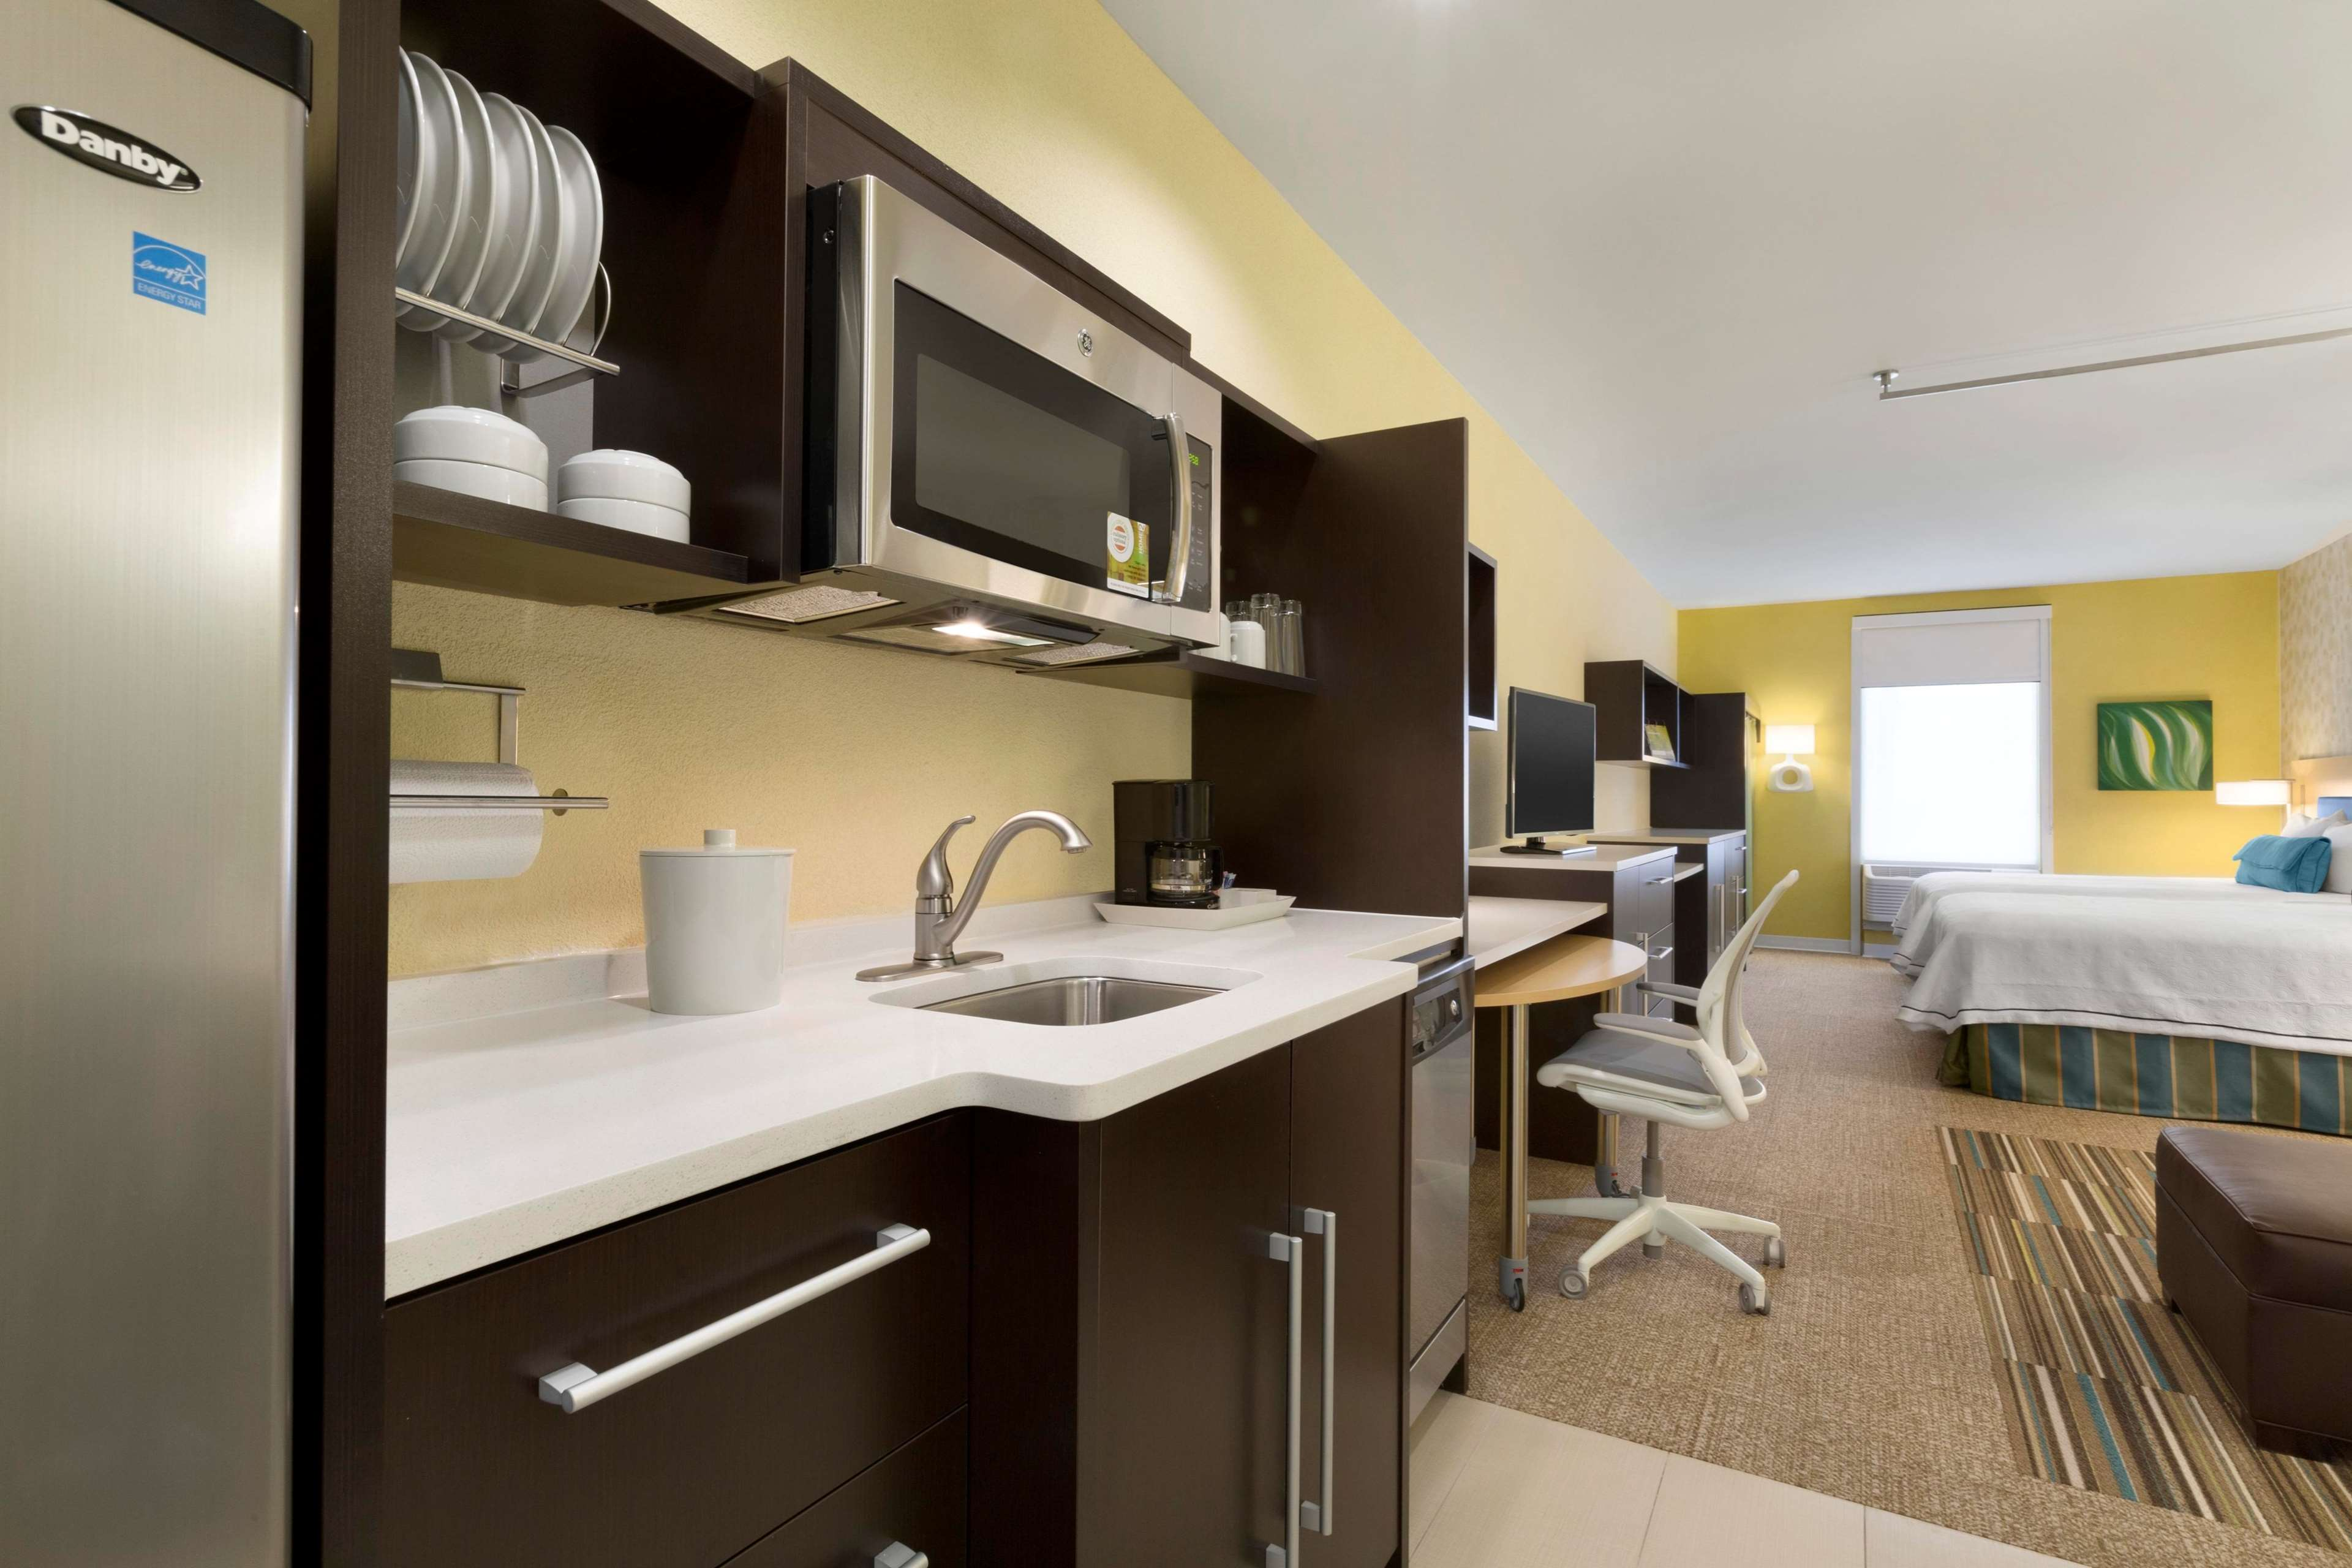 Home2 Suites by Hilton Houston Pasadena image 14